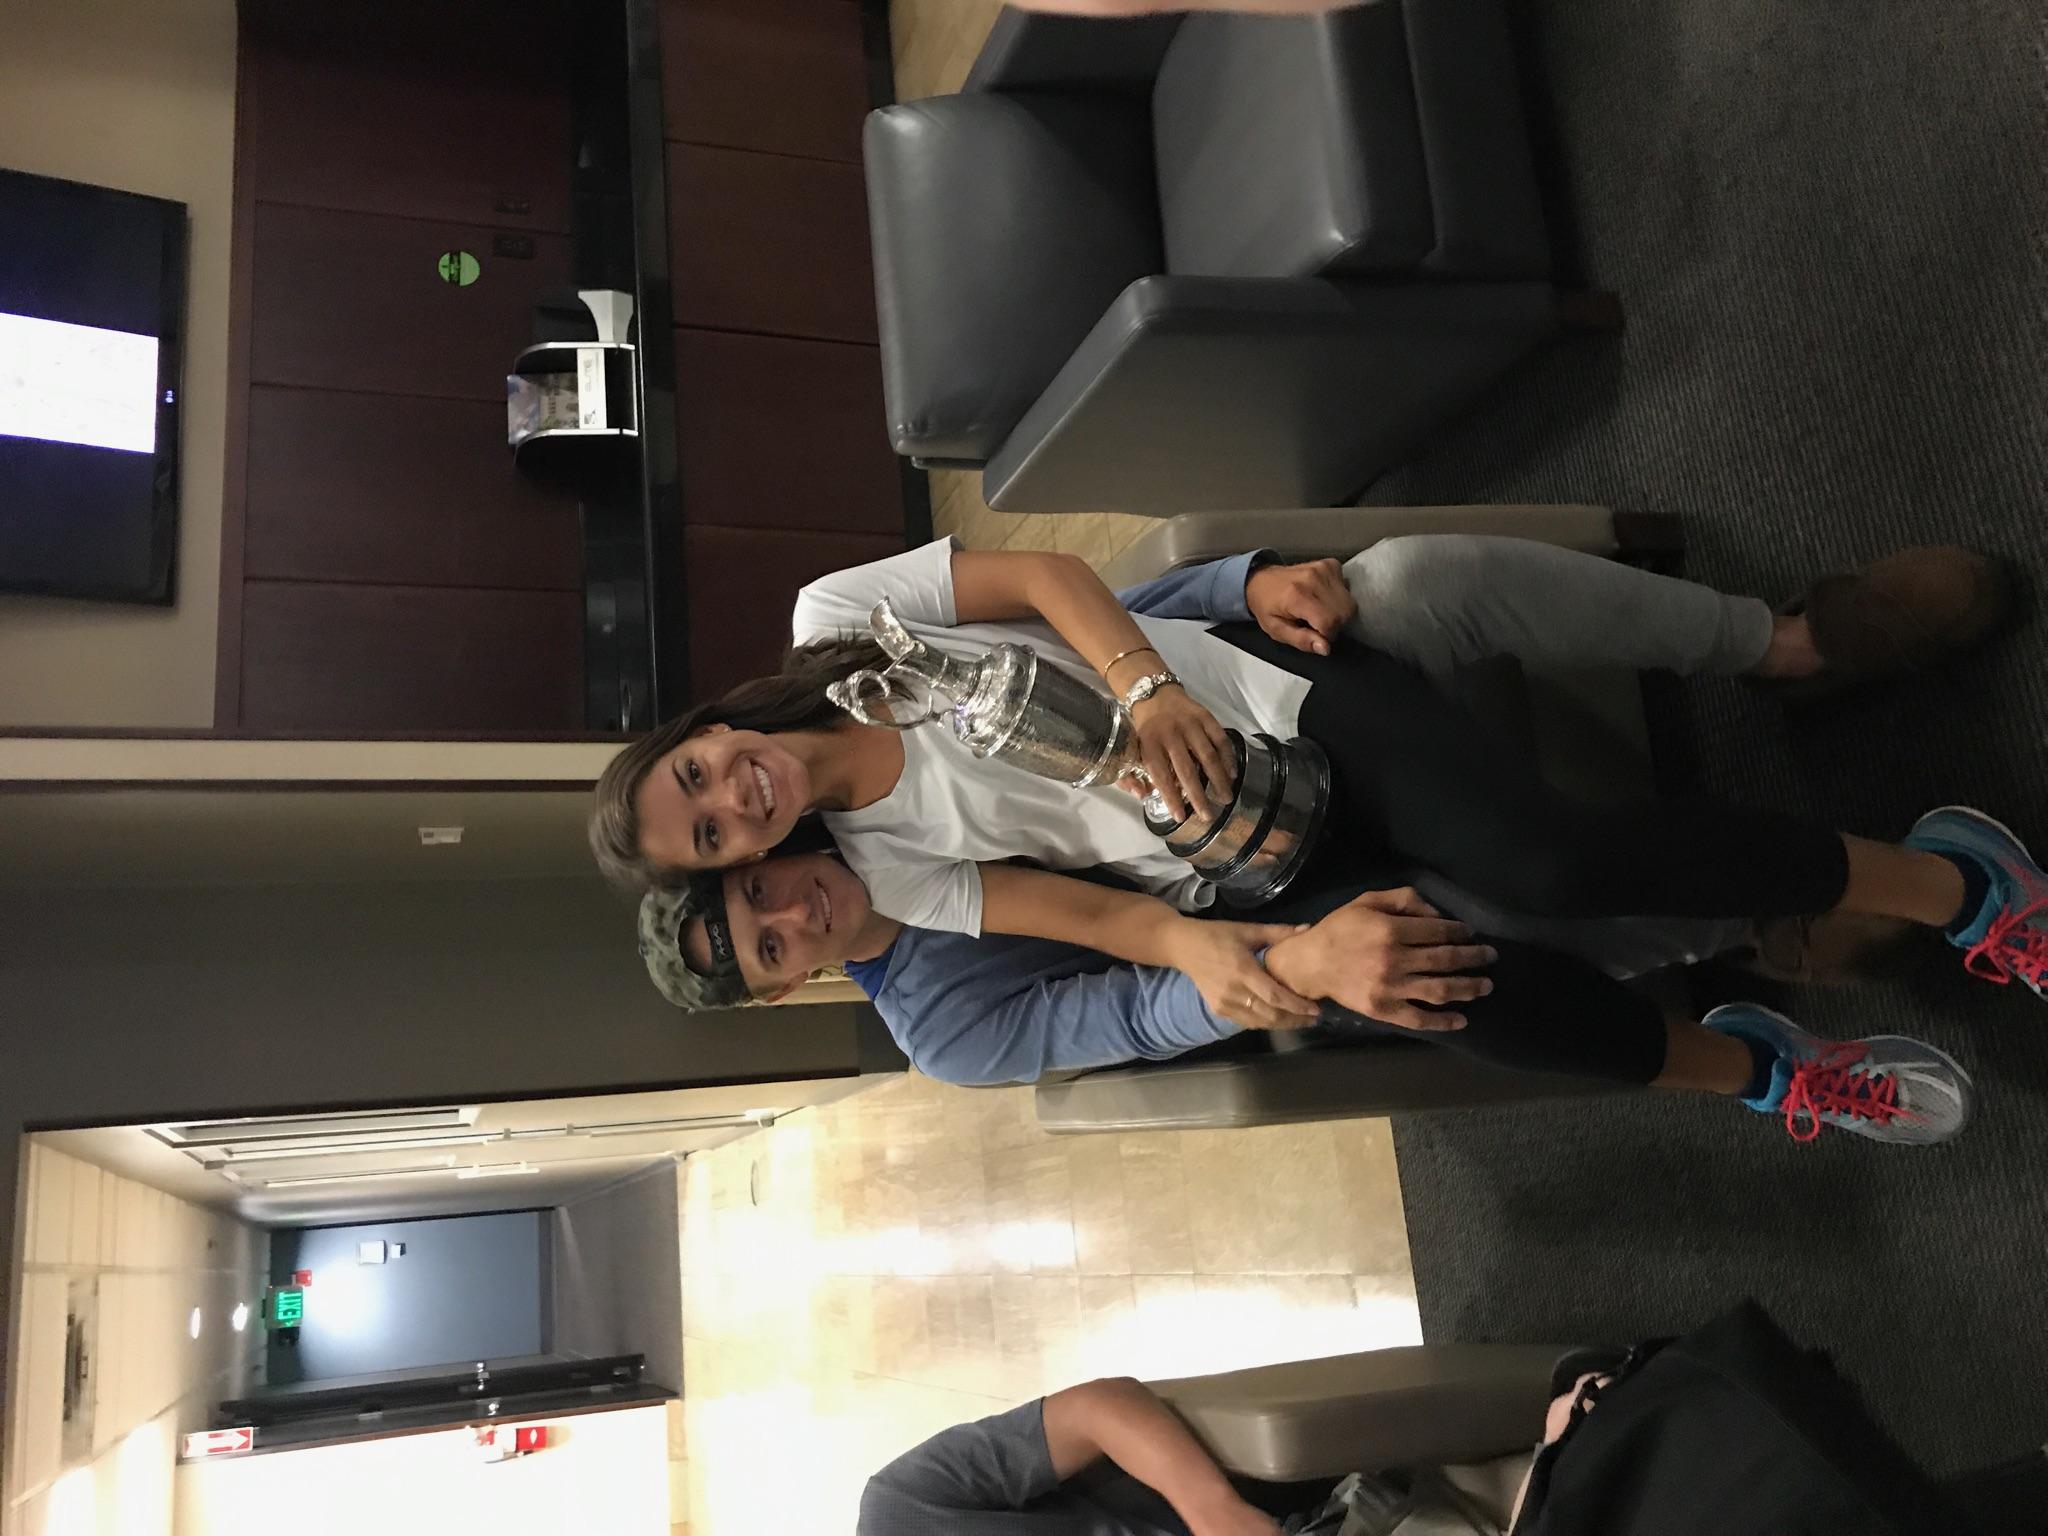 2017 Open Championship: Family Celebration - Jordan and Annie Verret